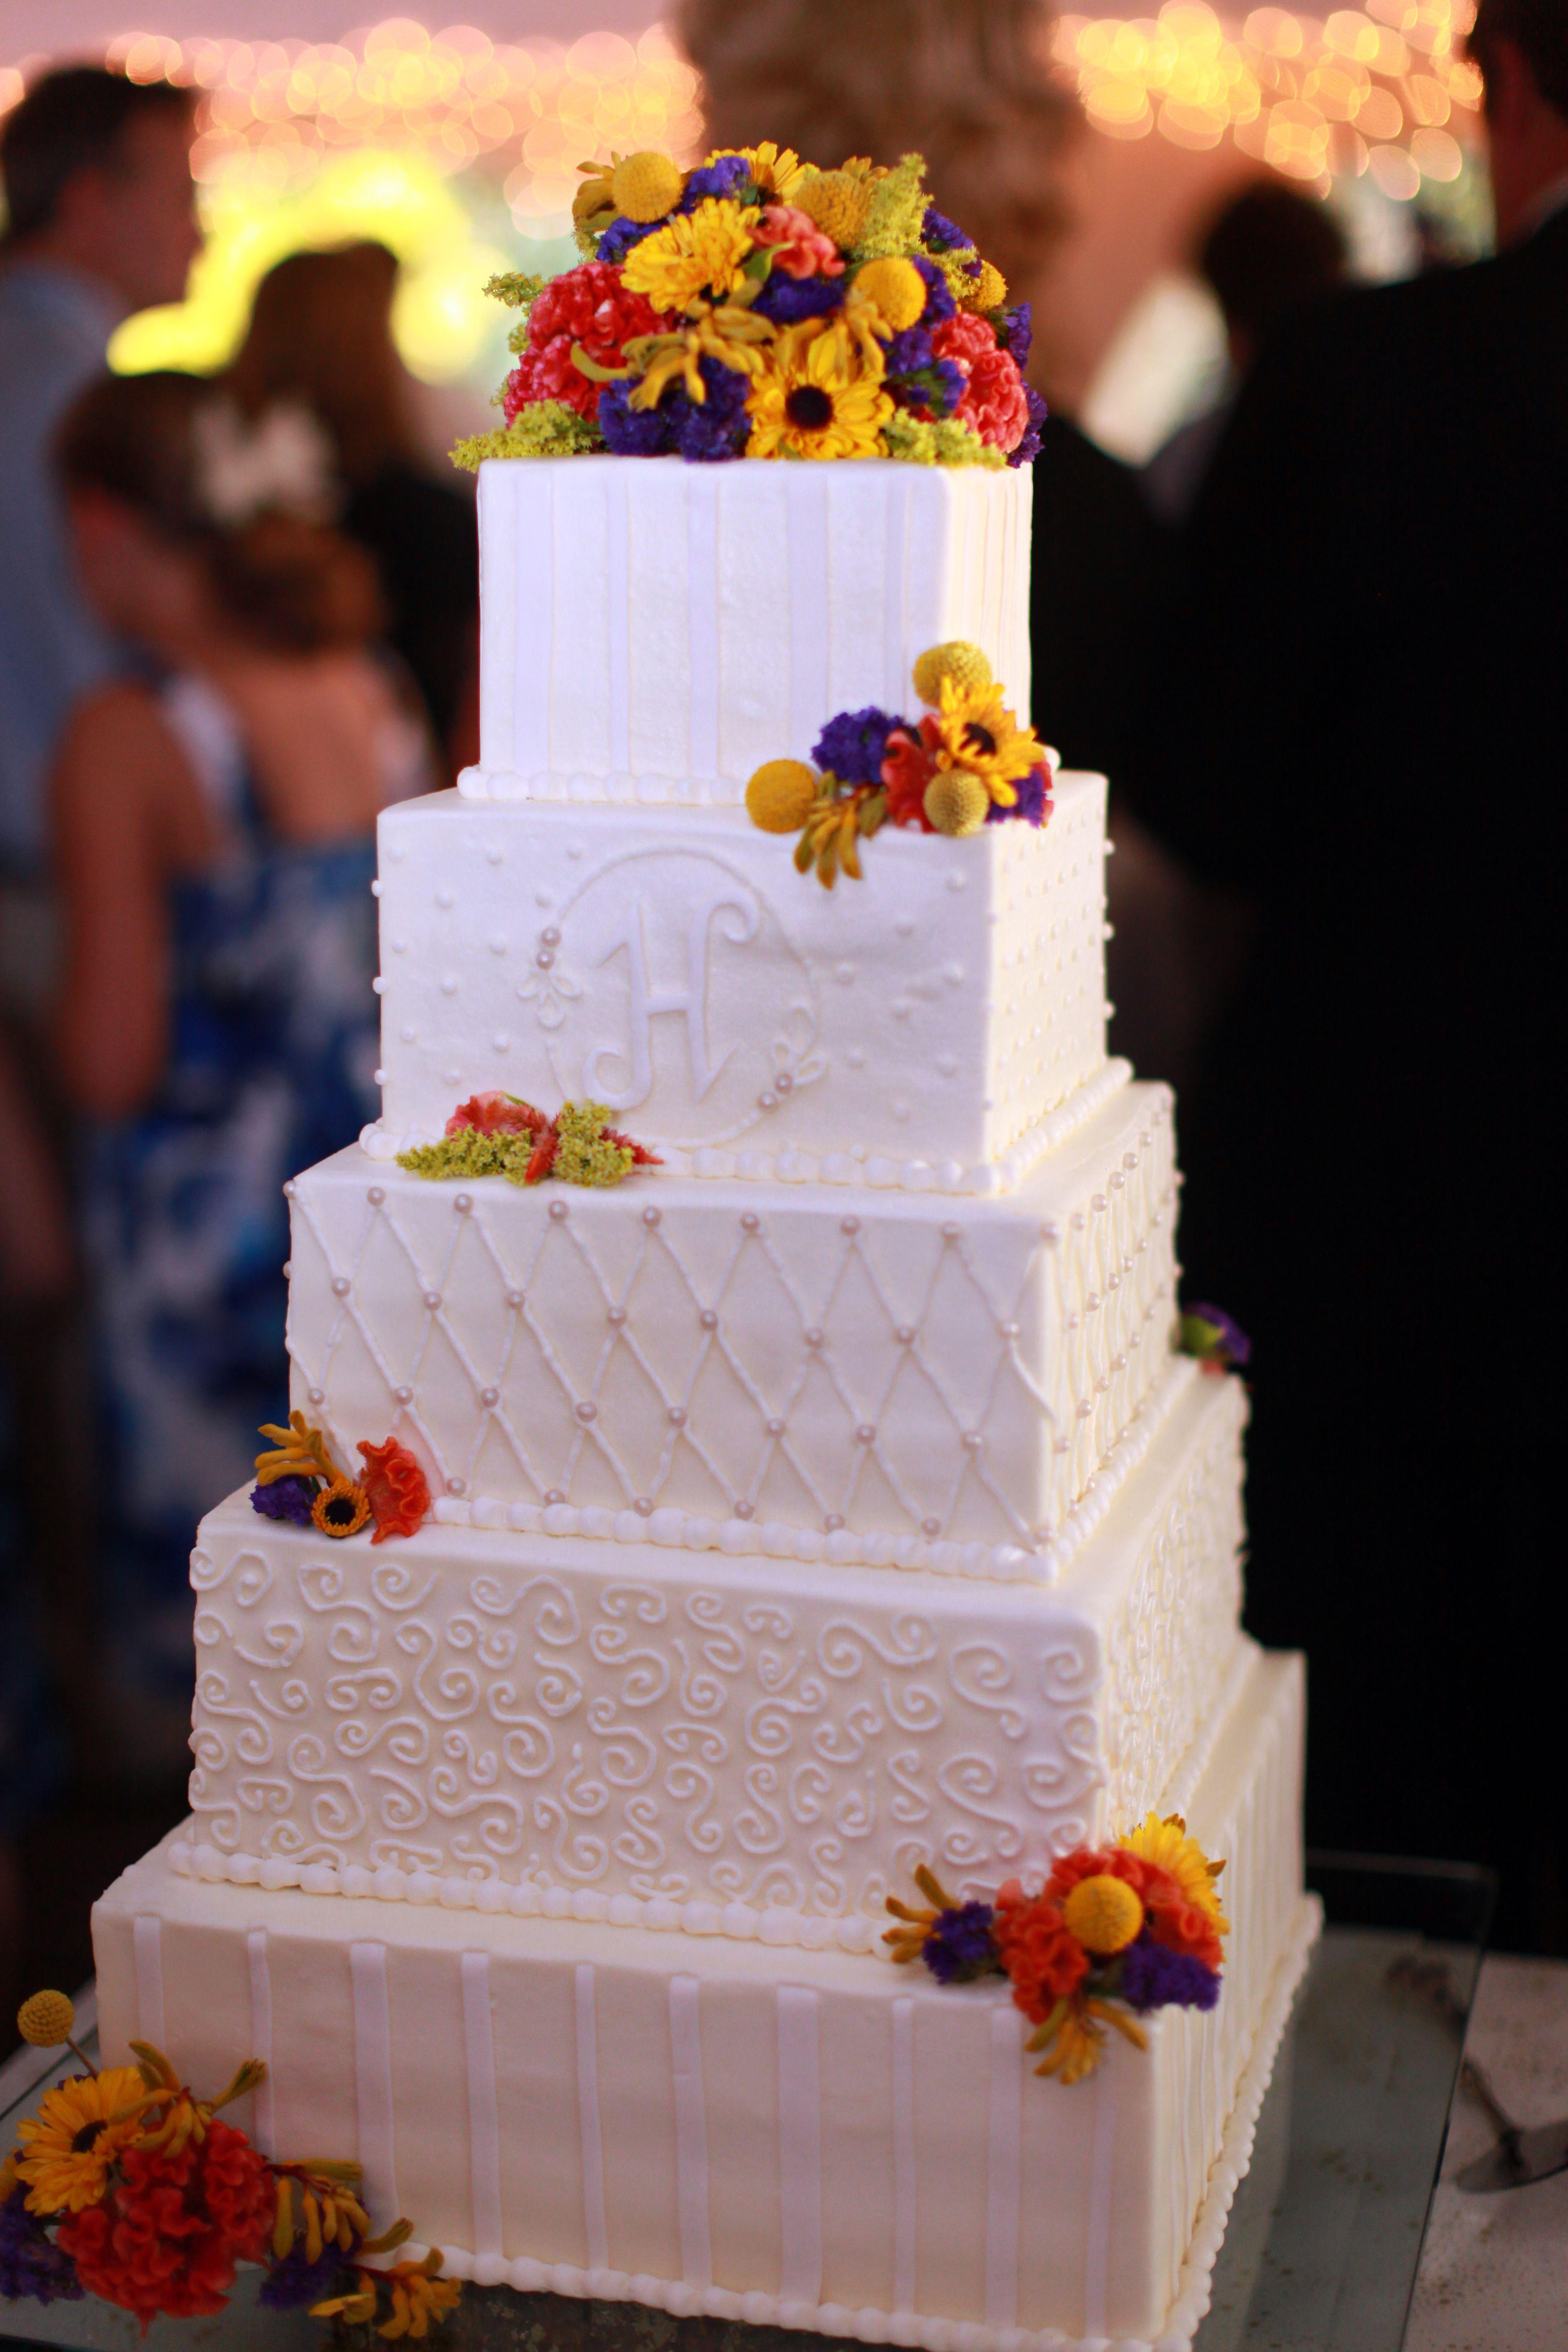 5 tier wedding cake - Fall Flowers on Cake - Fall Cakes ...